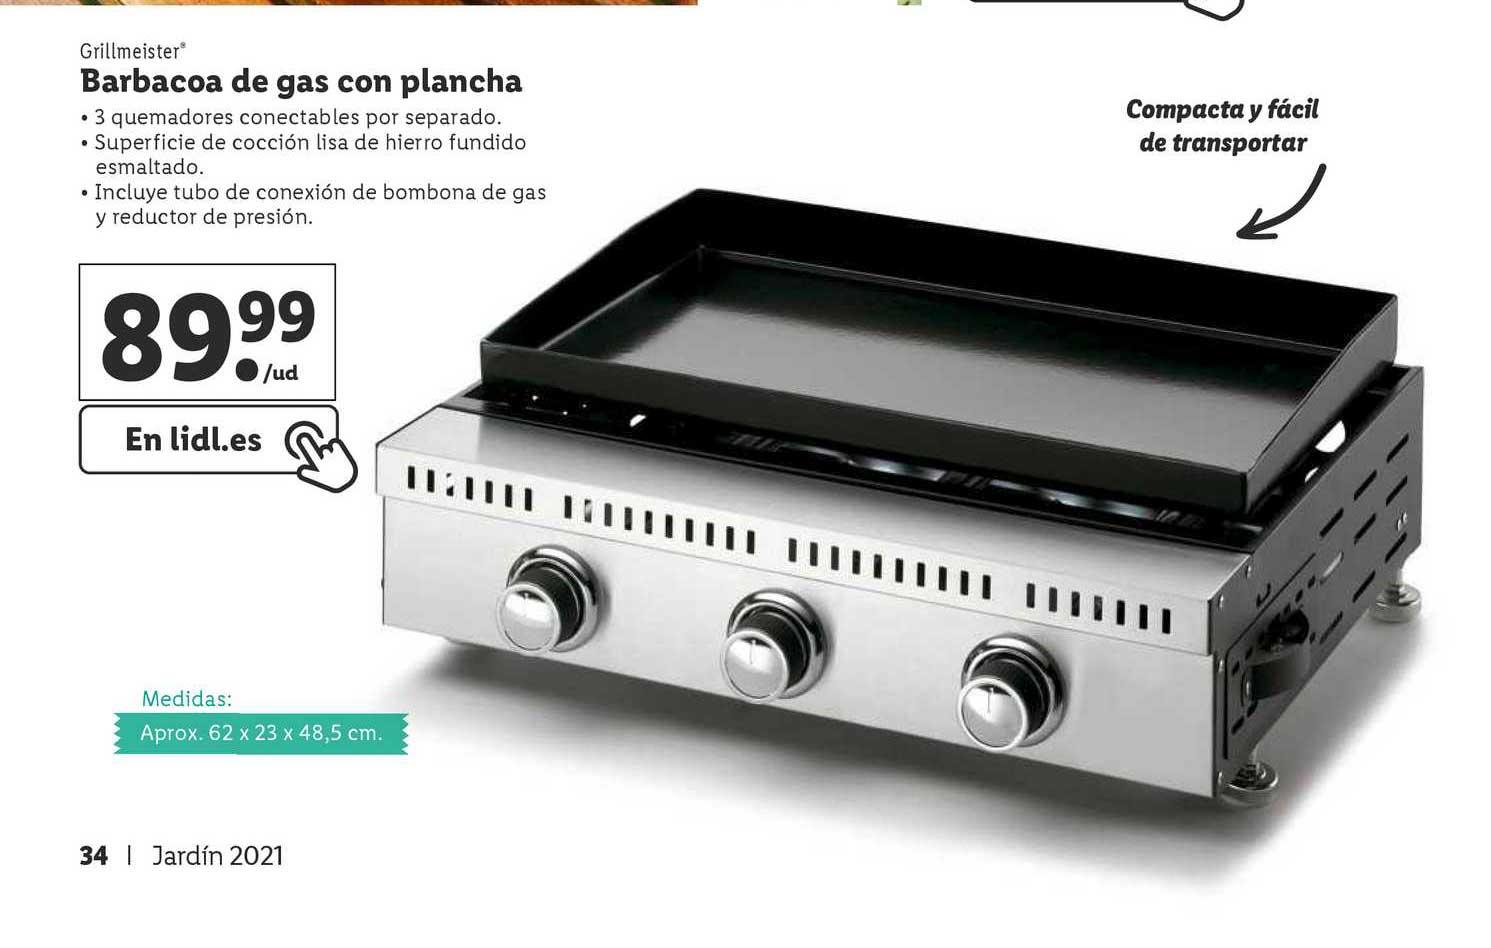 LIDL Grillmeister Barbacoa De Gas Con Plancha